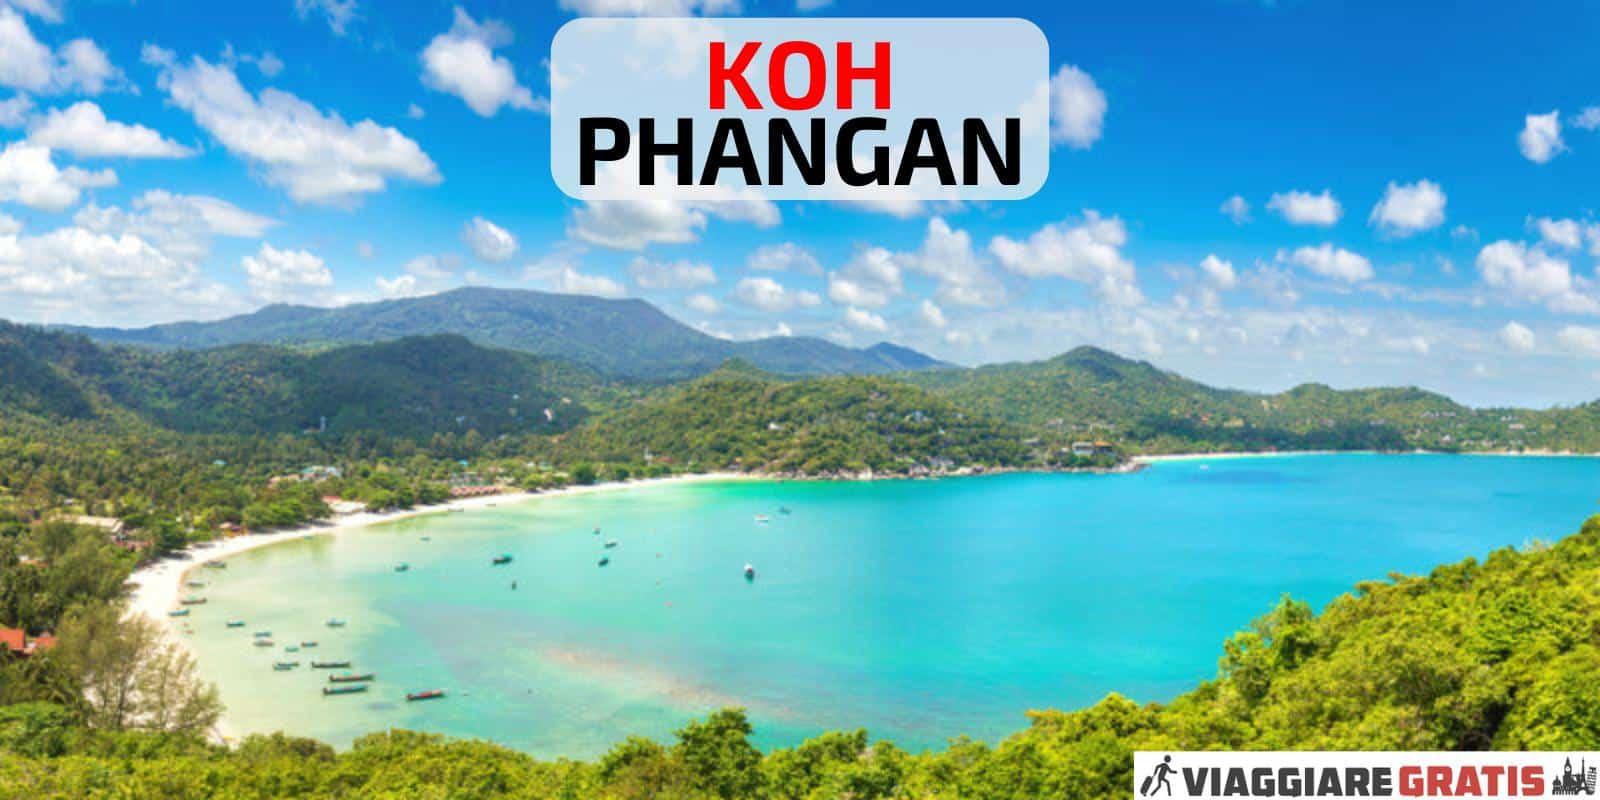 Isola di Koh Phangan cosa vedere